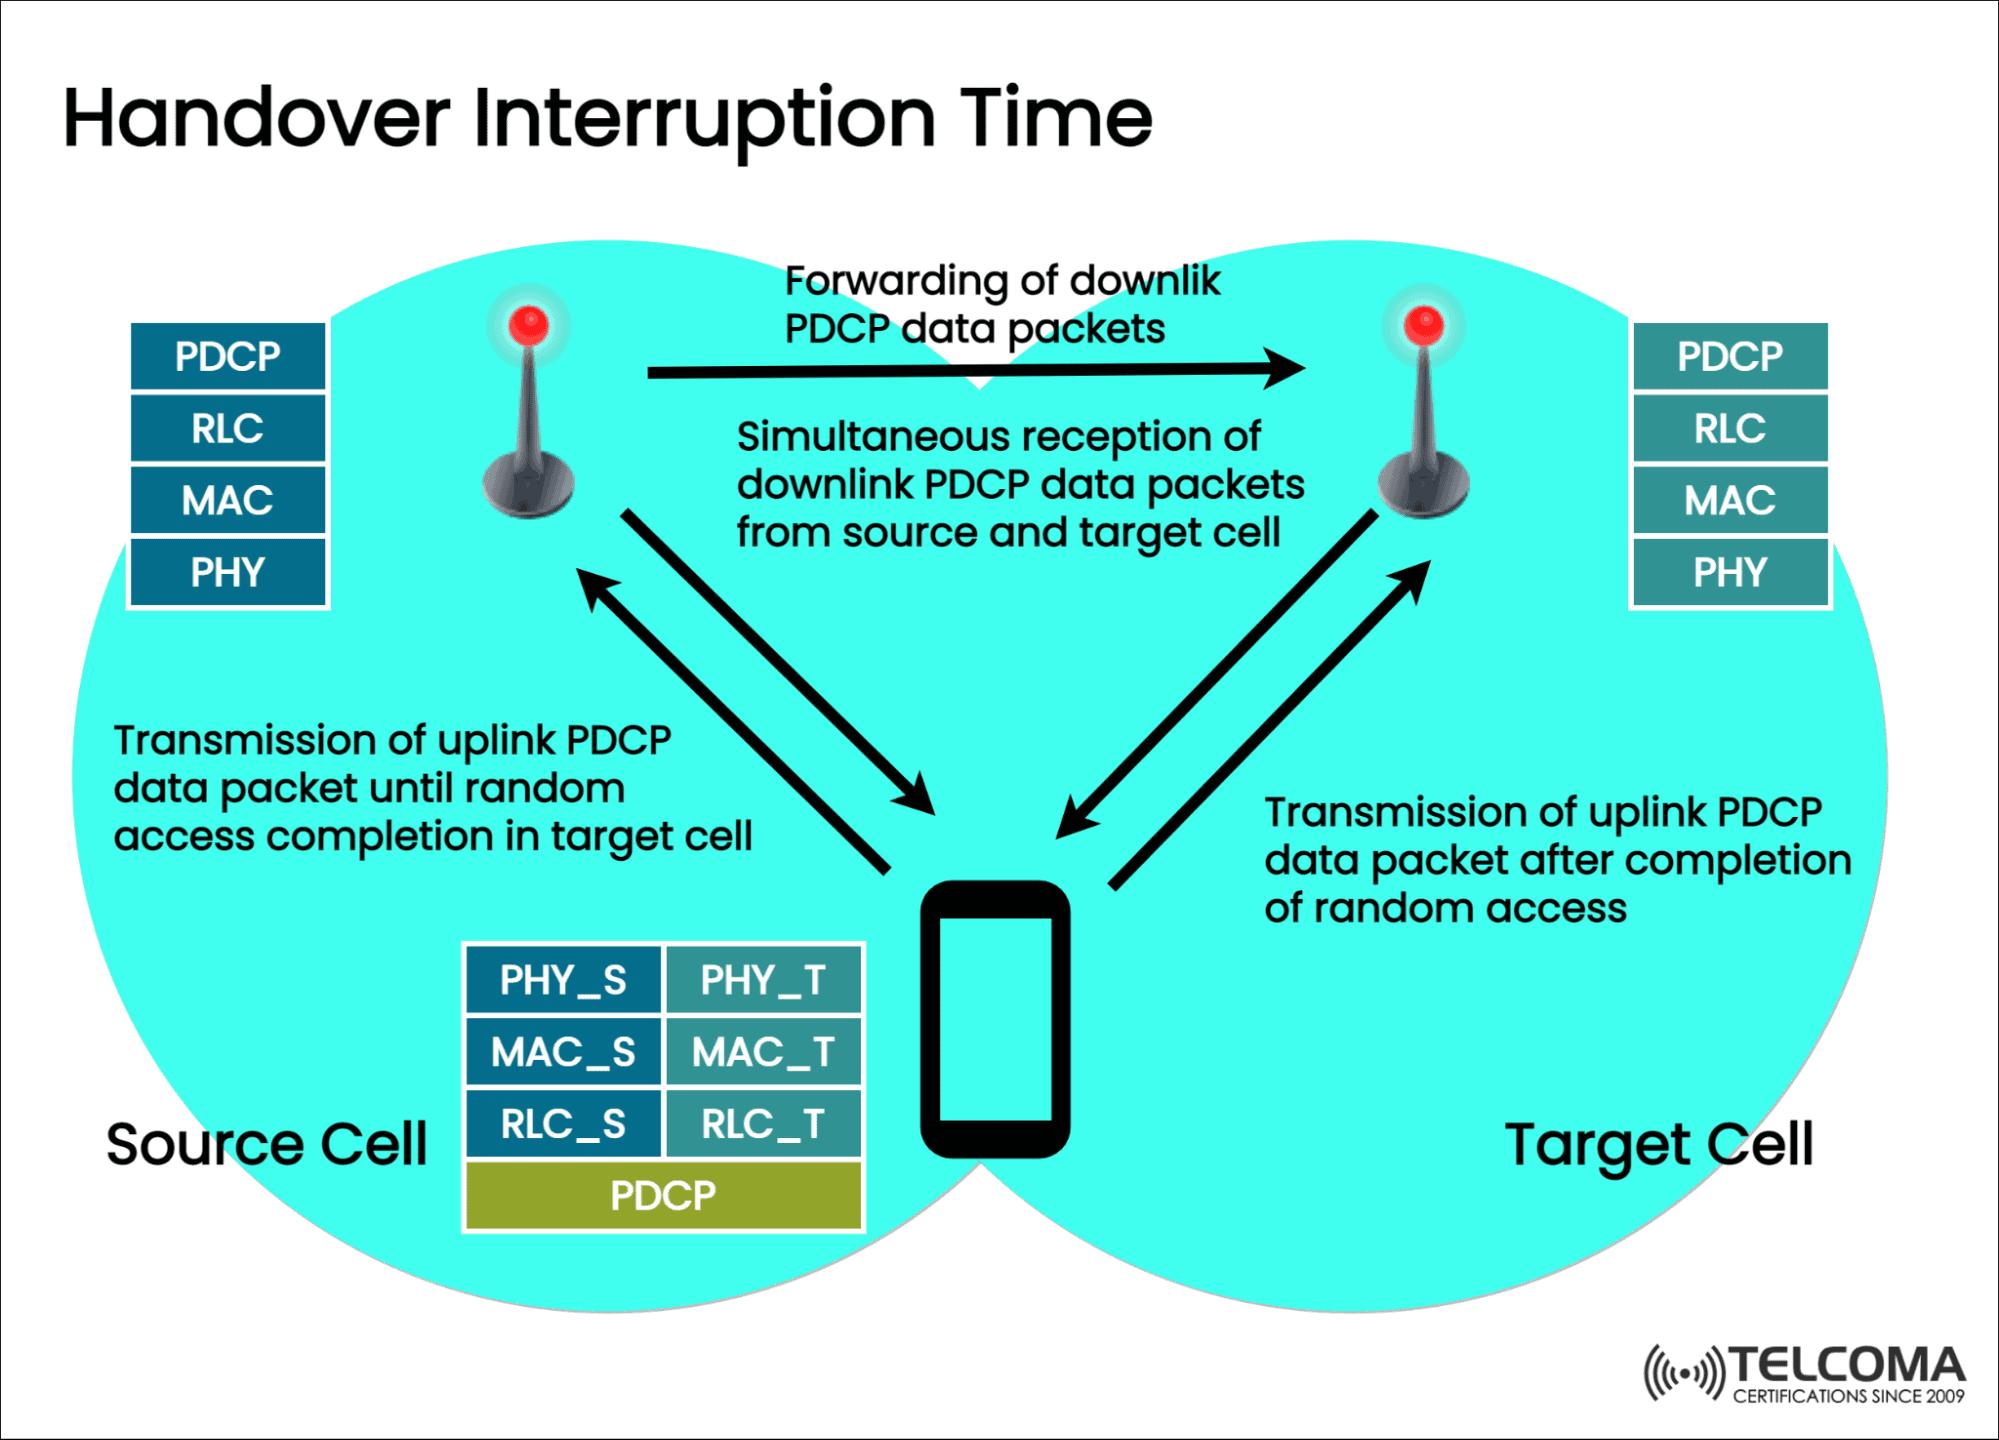 handover interruption time